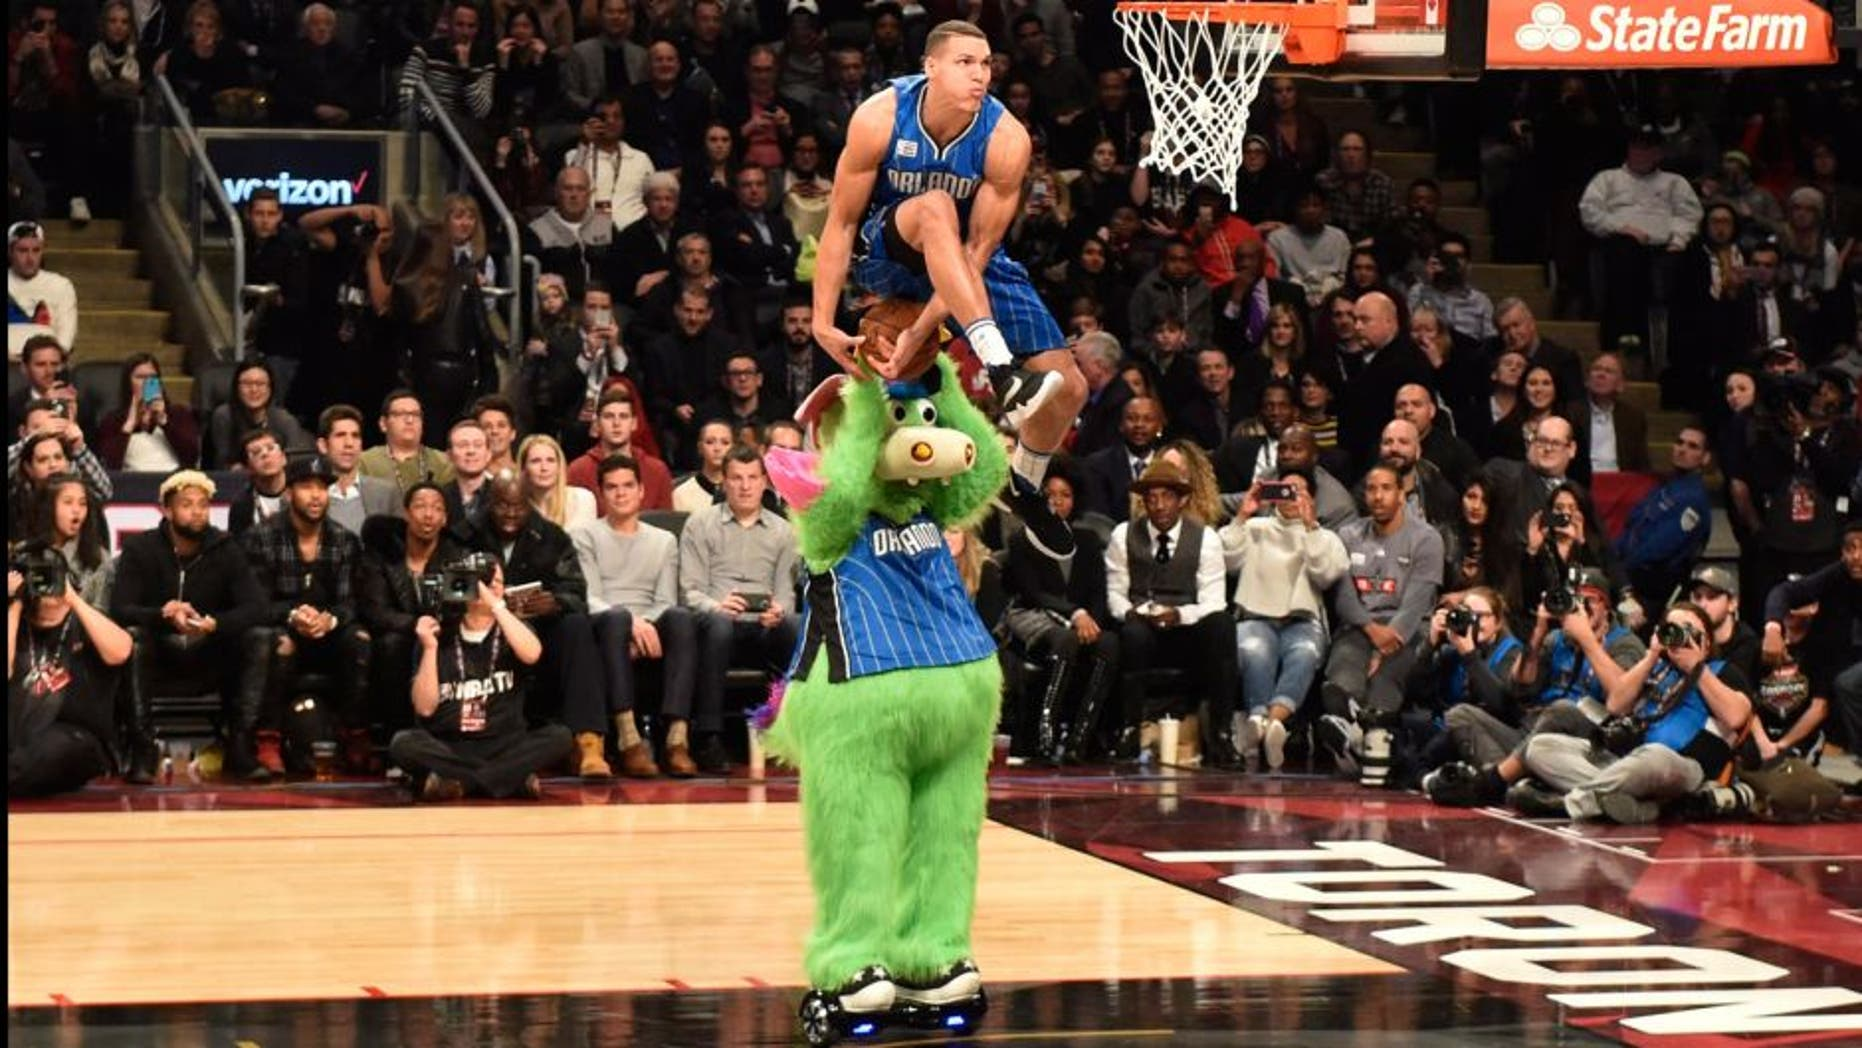 Orlando Magic forward Aaron Gordon competes during the NBA all-star slam dunk skills competition in Toronto on Saturday, Feb. 13, 2016. (Mark Blinch/The Canadian Press via AP) MANDATORY CREDIT